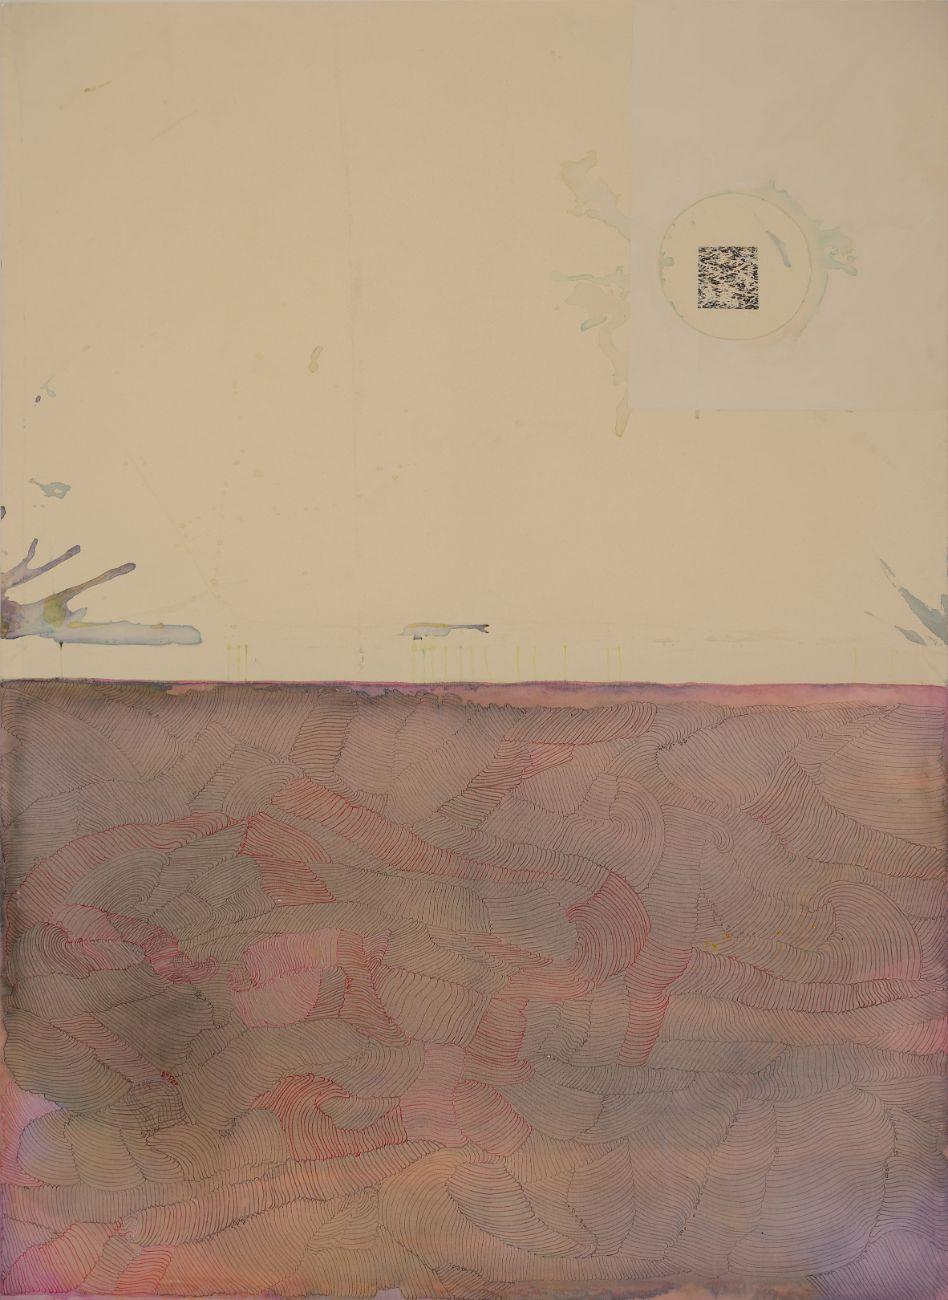 The sea, 136x190cm, mixed media on canvas, 2016